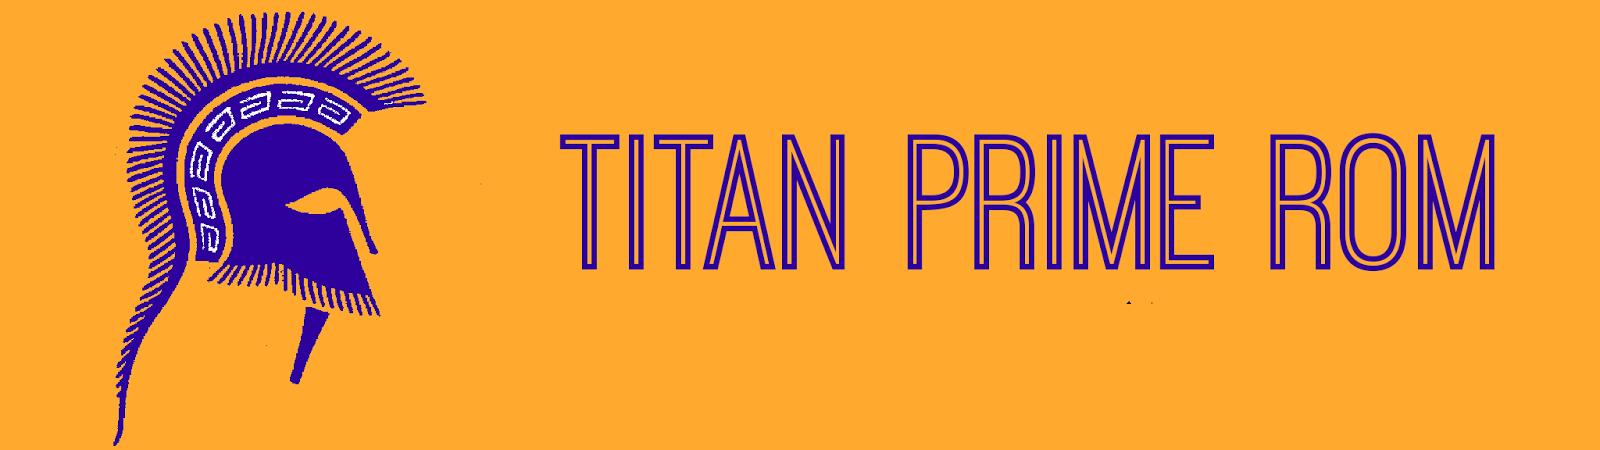 titan-prime-rom-moto-g-2014-titan